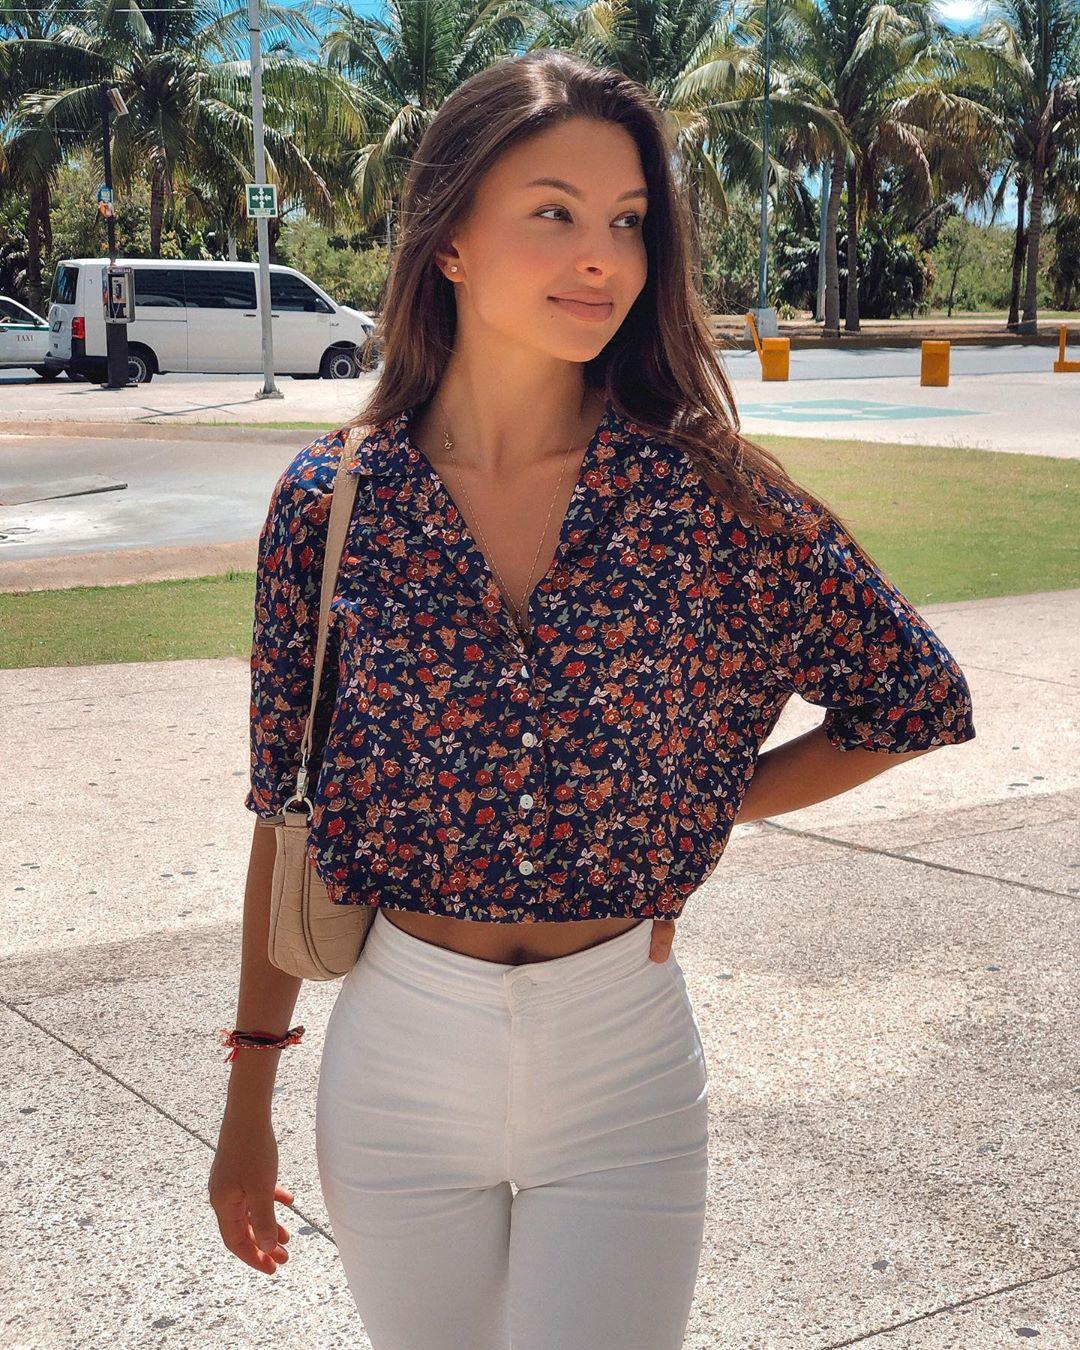 Alina-Brady-Wallpapers-Insta-Biography-6